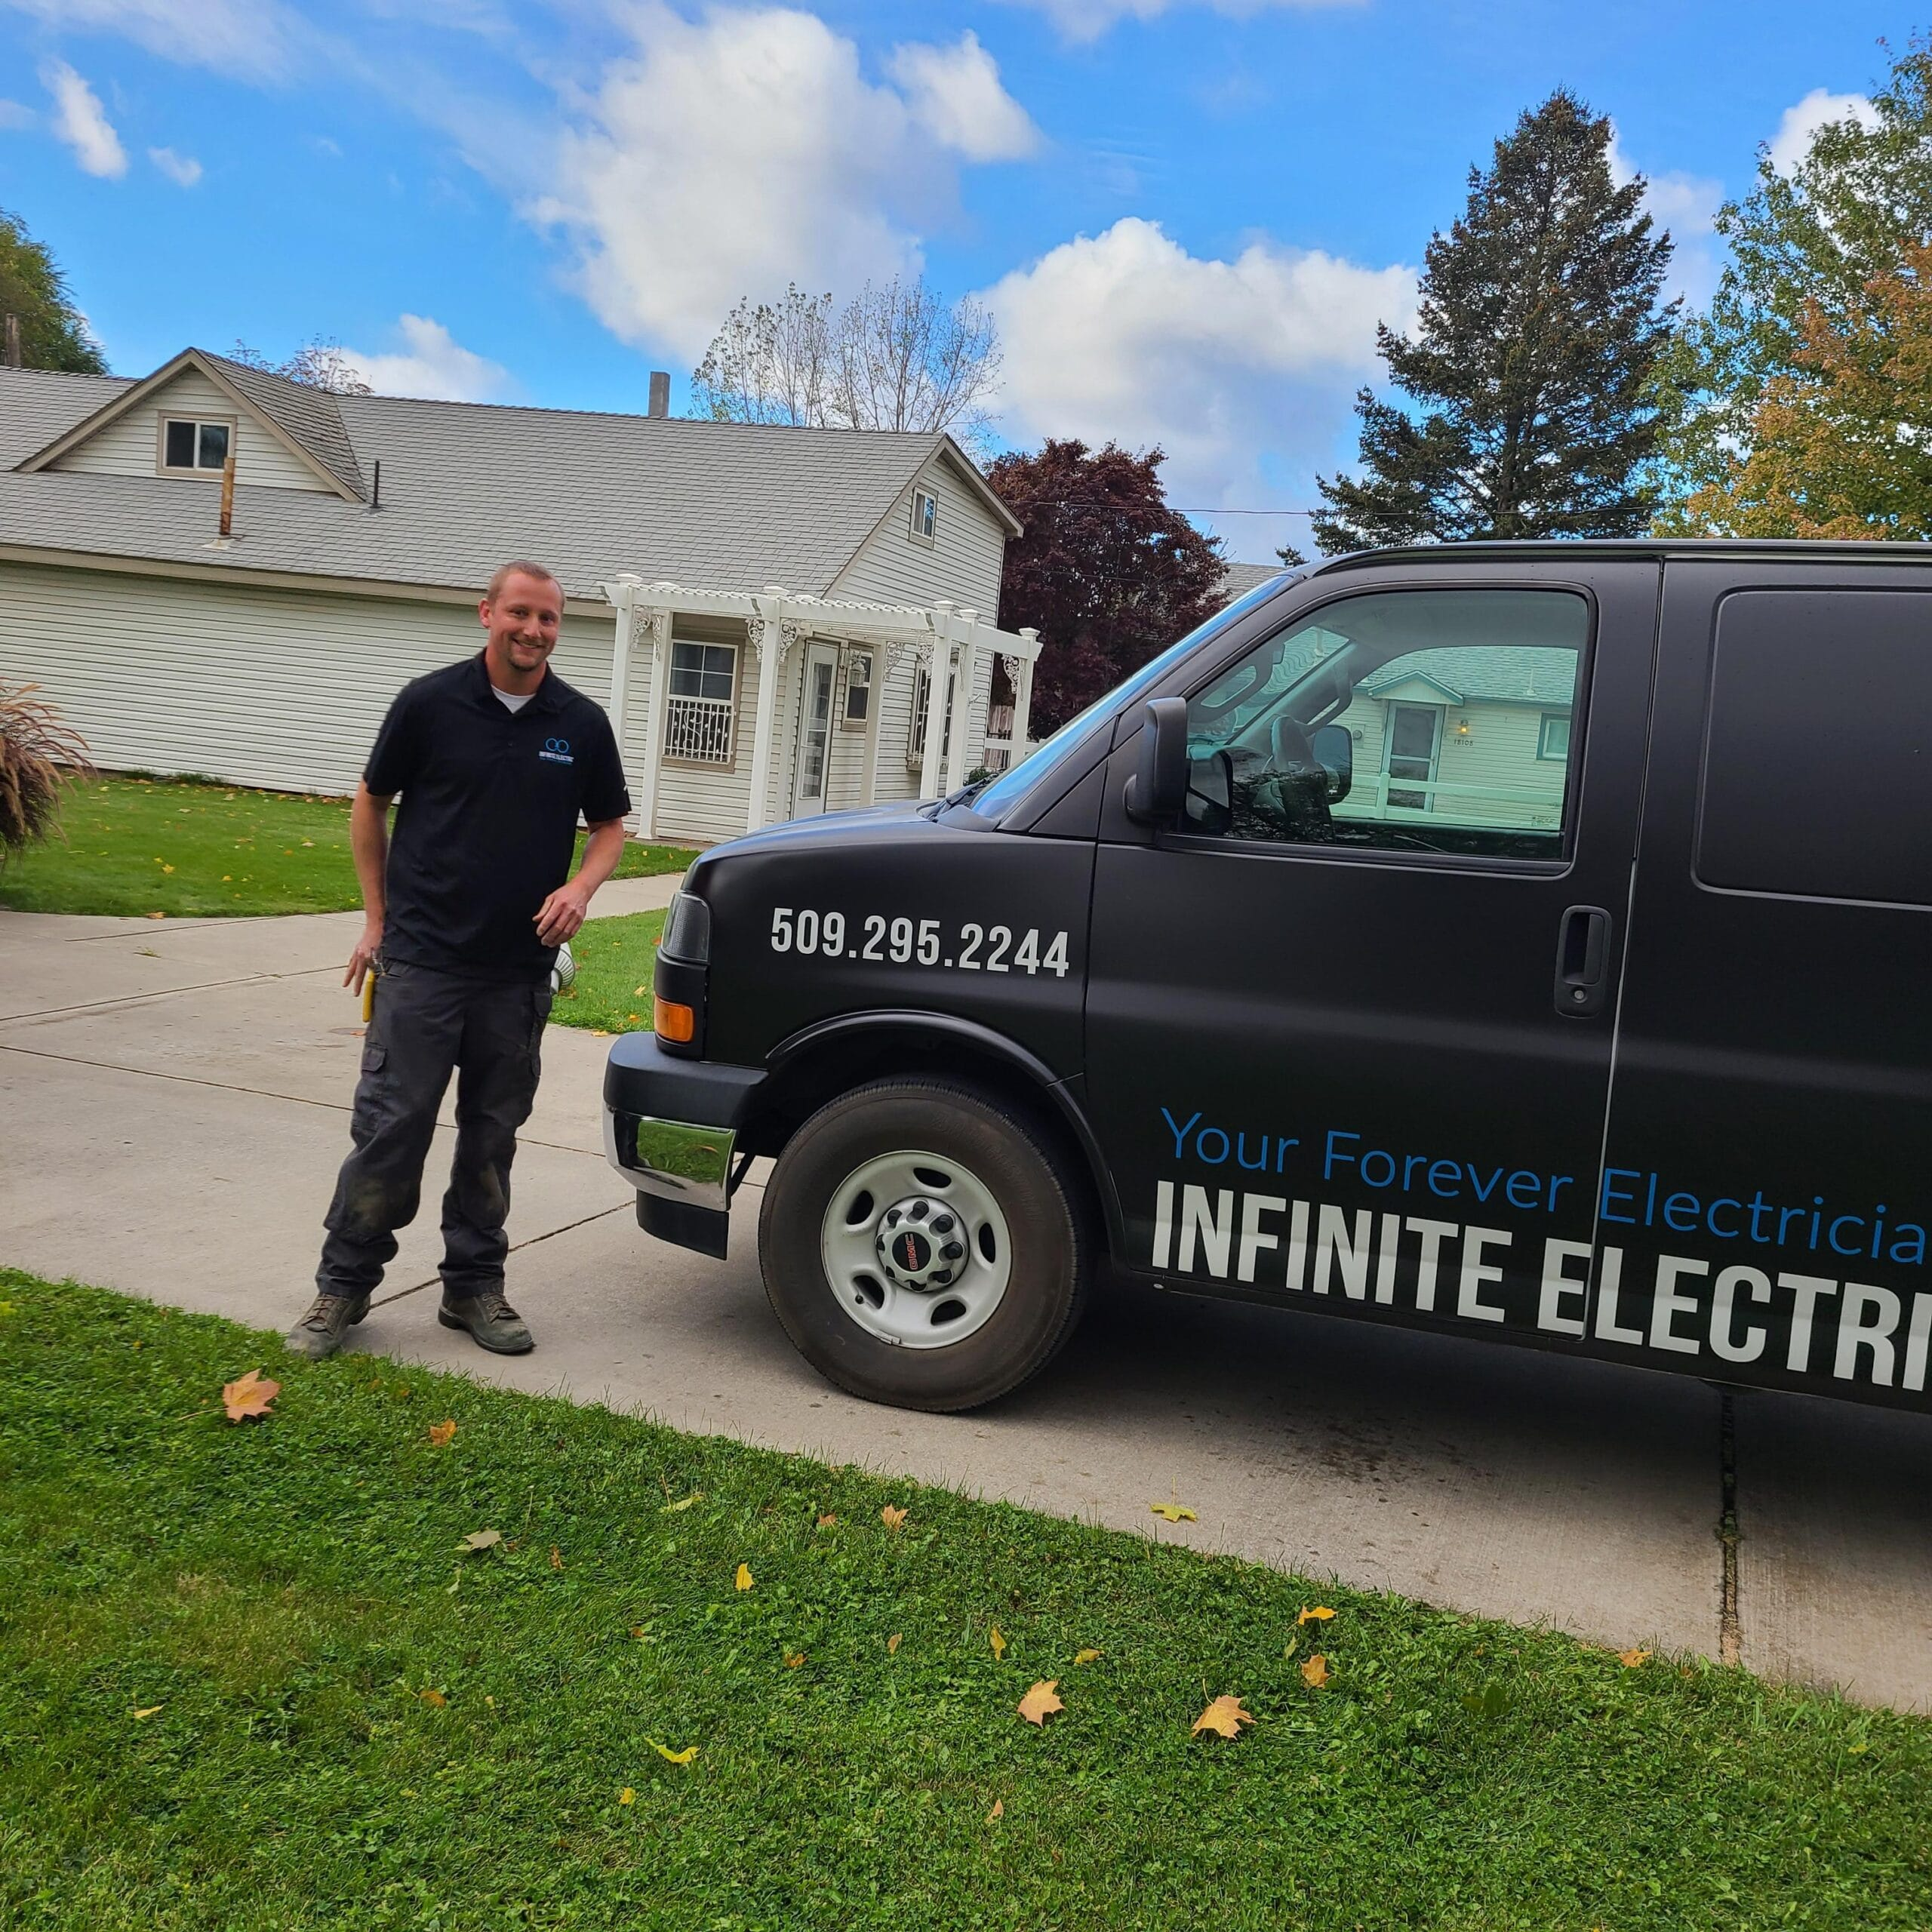 Spokane South Hill Electrician